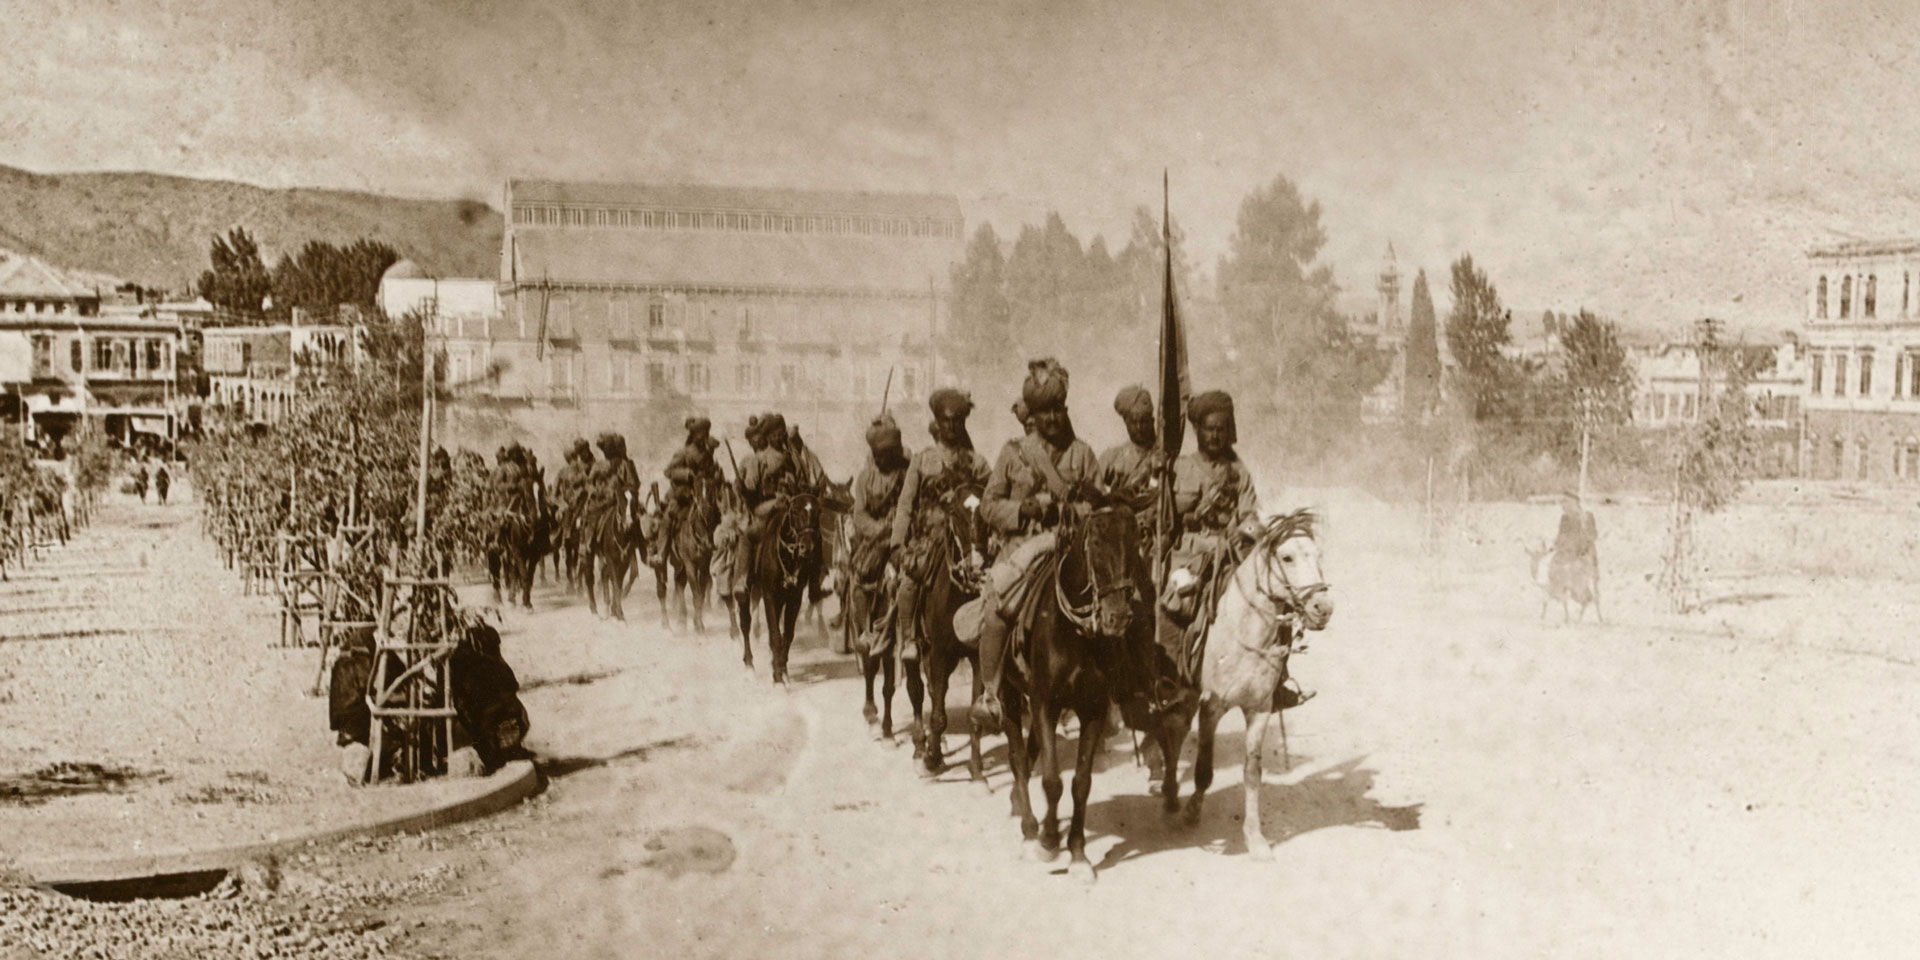 9th Hodson's Horse march through Damascus, 2 October 1918